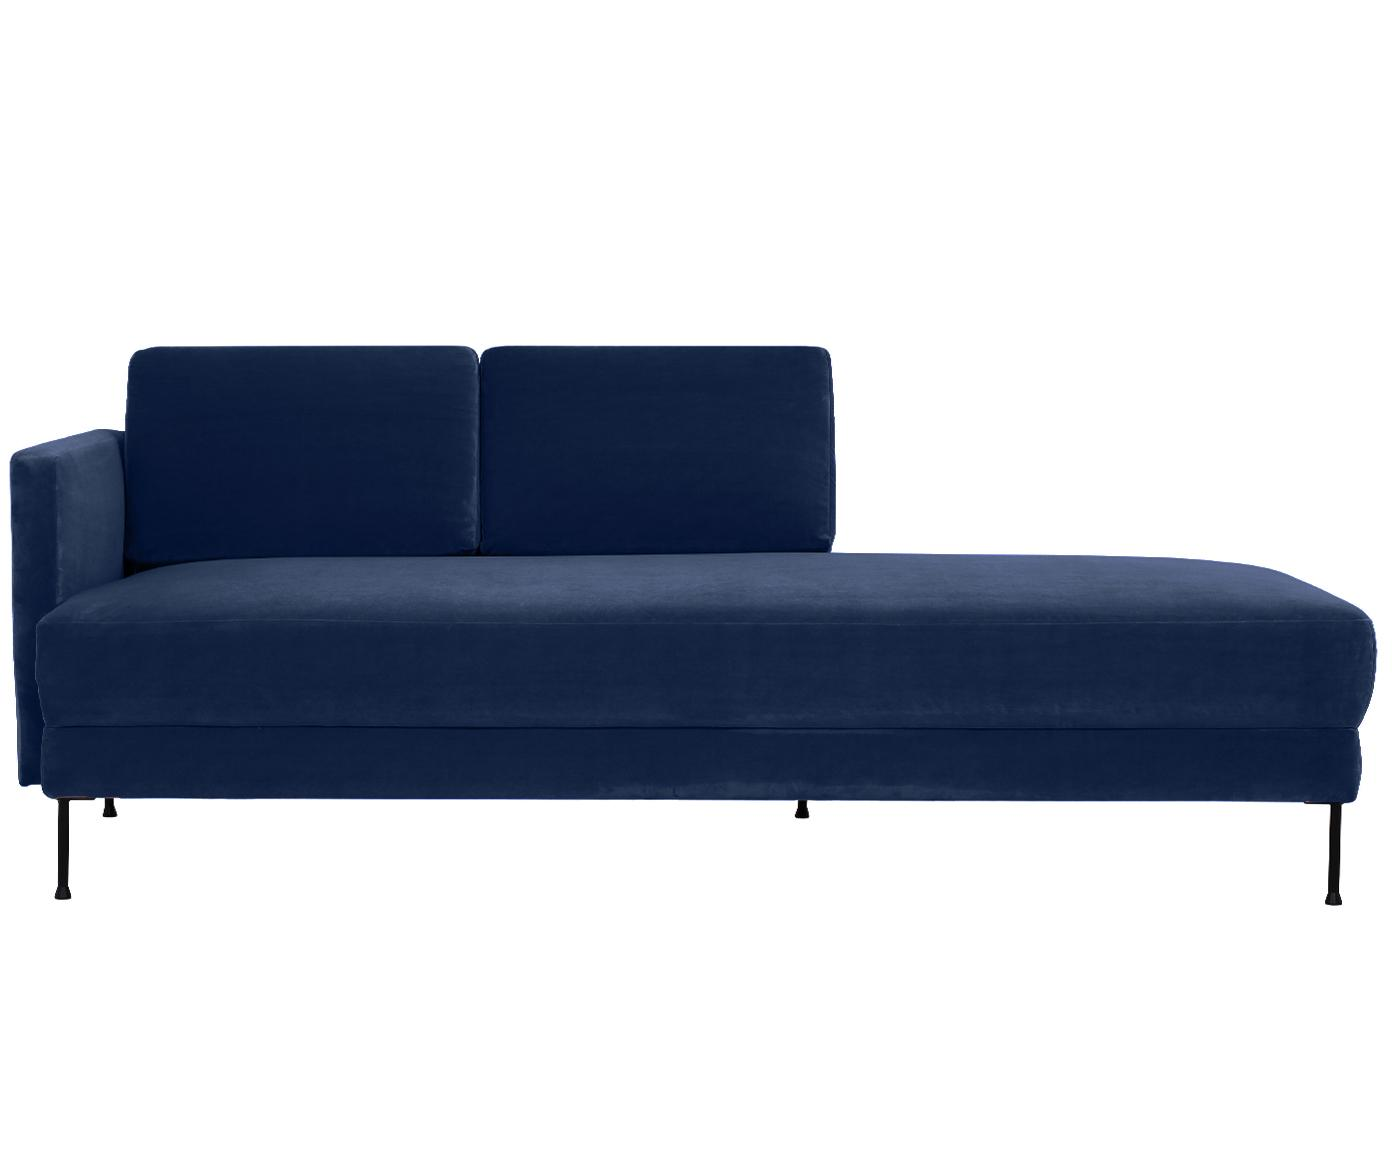 Fluwelen chaise longue Fluente, Bekleding: fluweel (hoogwaardig poly, Frame: massief grenenhout, Poten: gelakt metaal, Donkerblauw, B 201 x D 83 cm